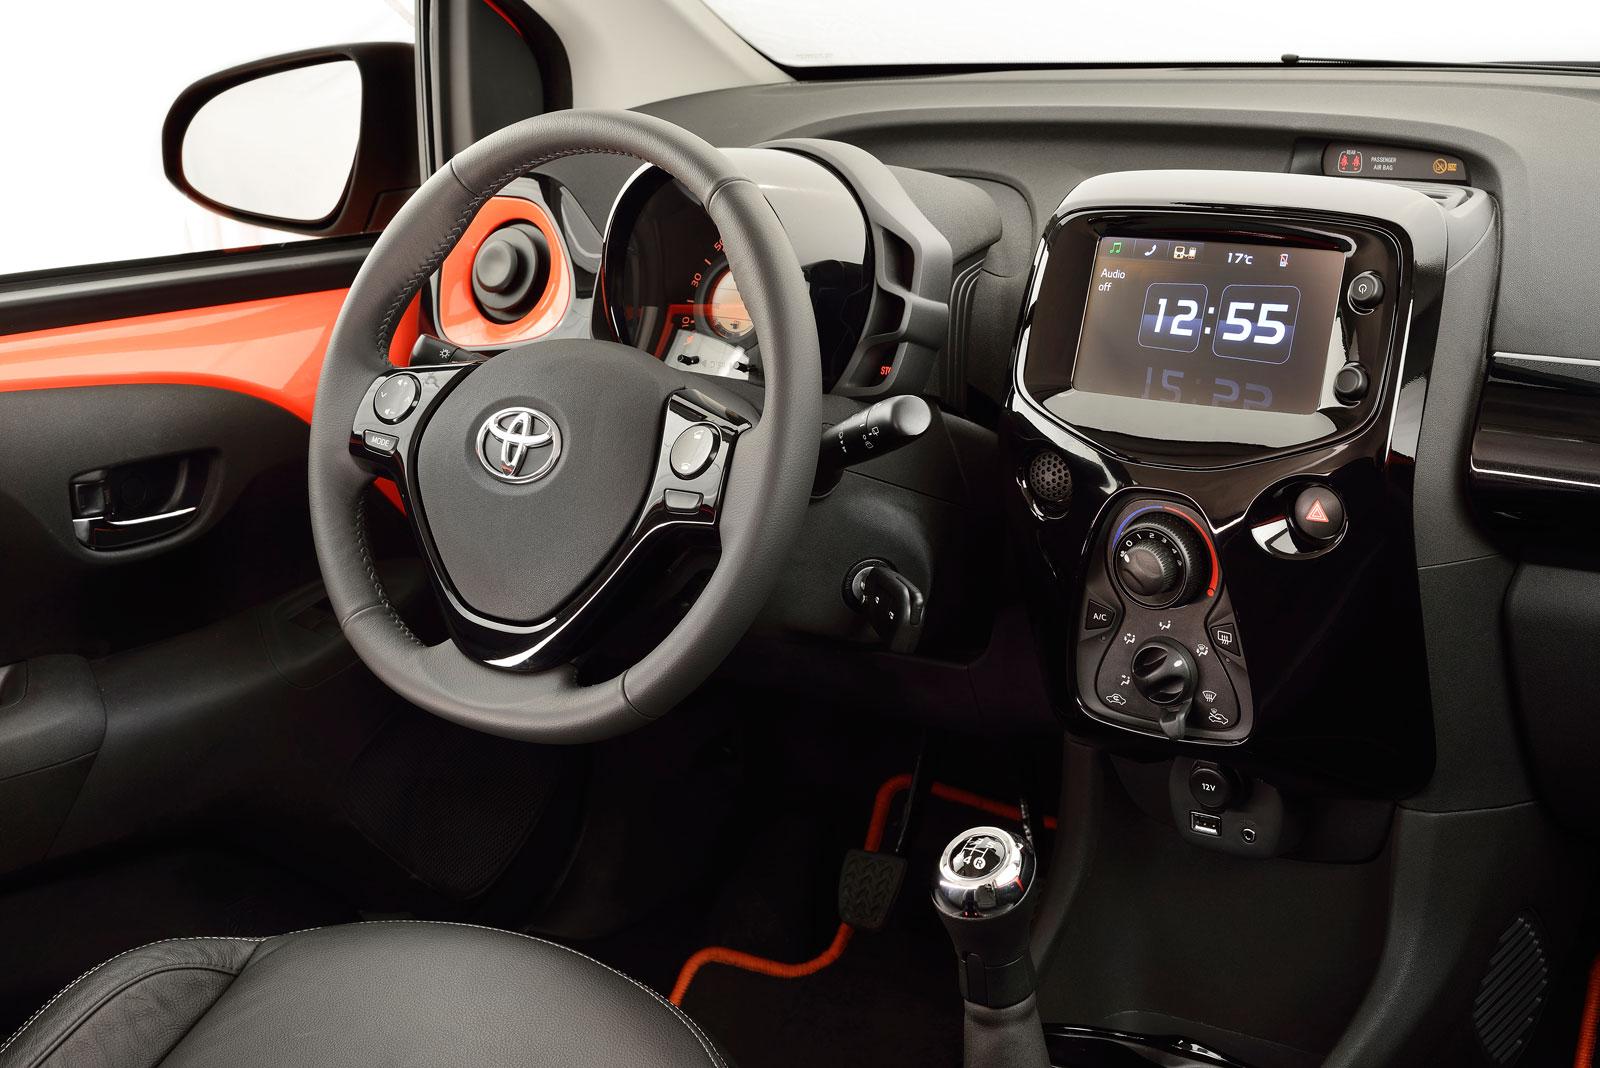 http://www.carbodydesign.com/media/2014/03/New-Toyota-Aygo-Interior-01.jpg